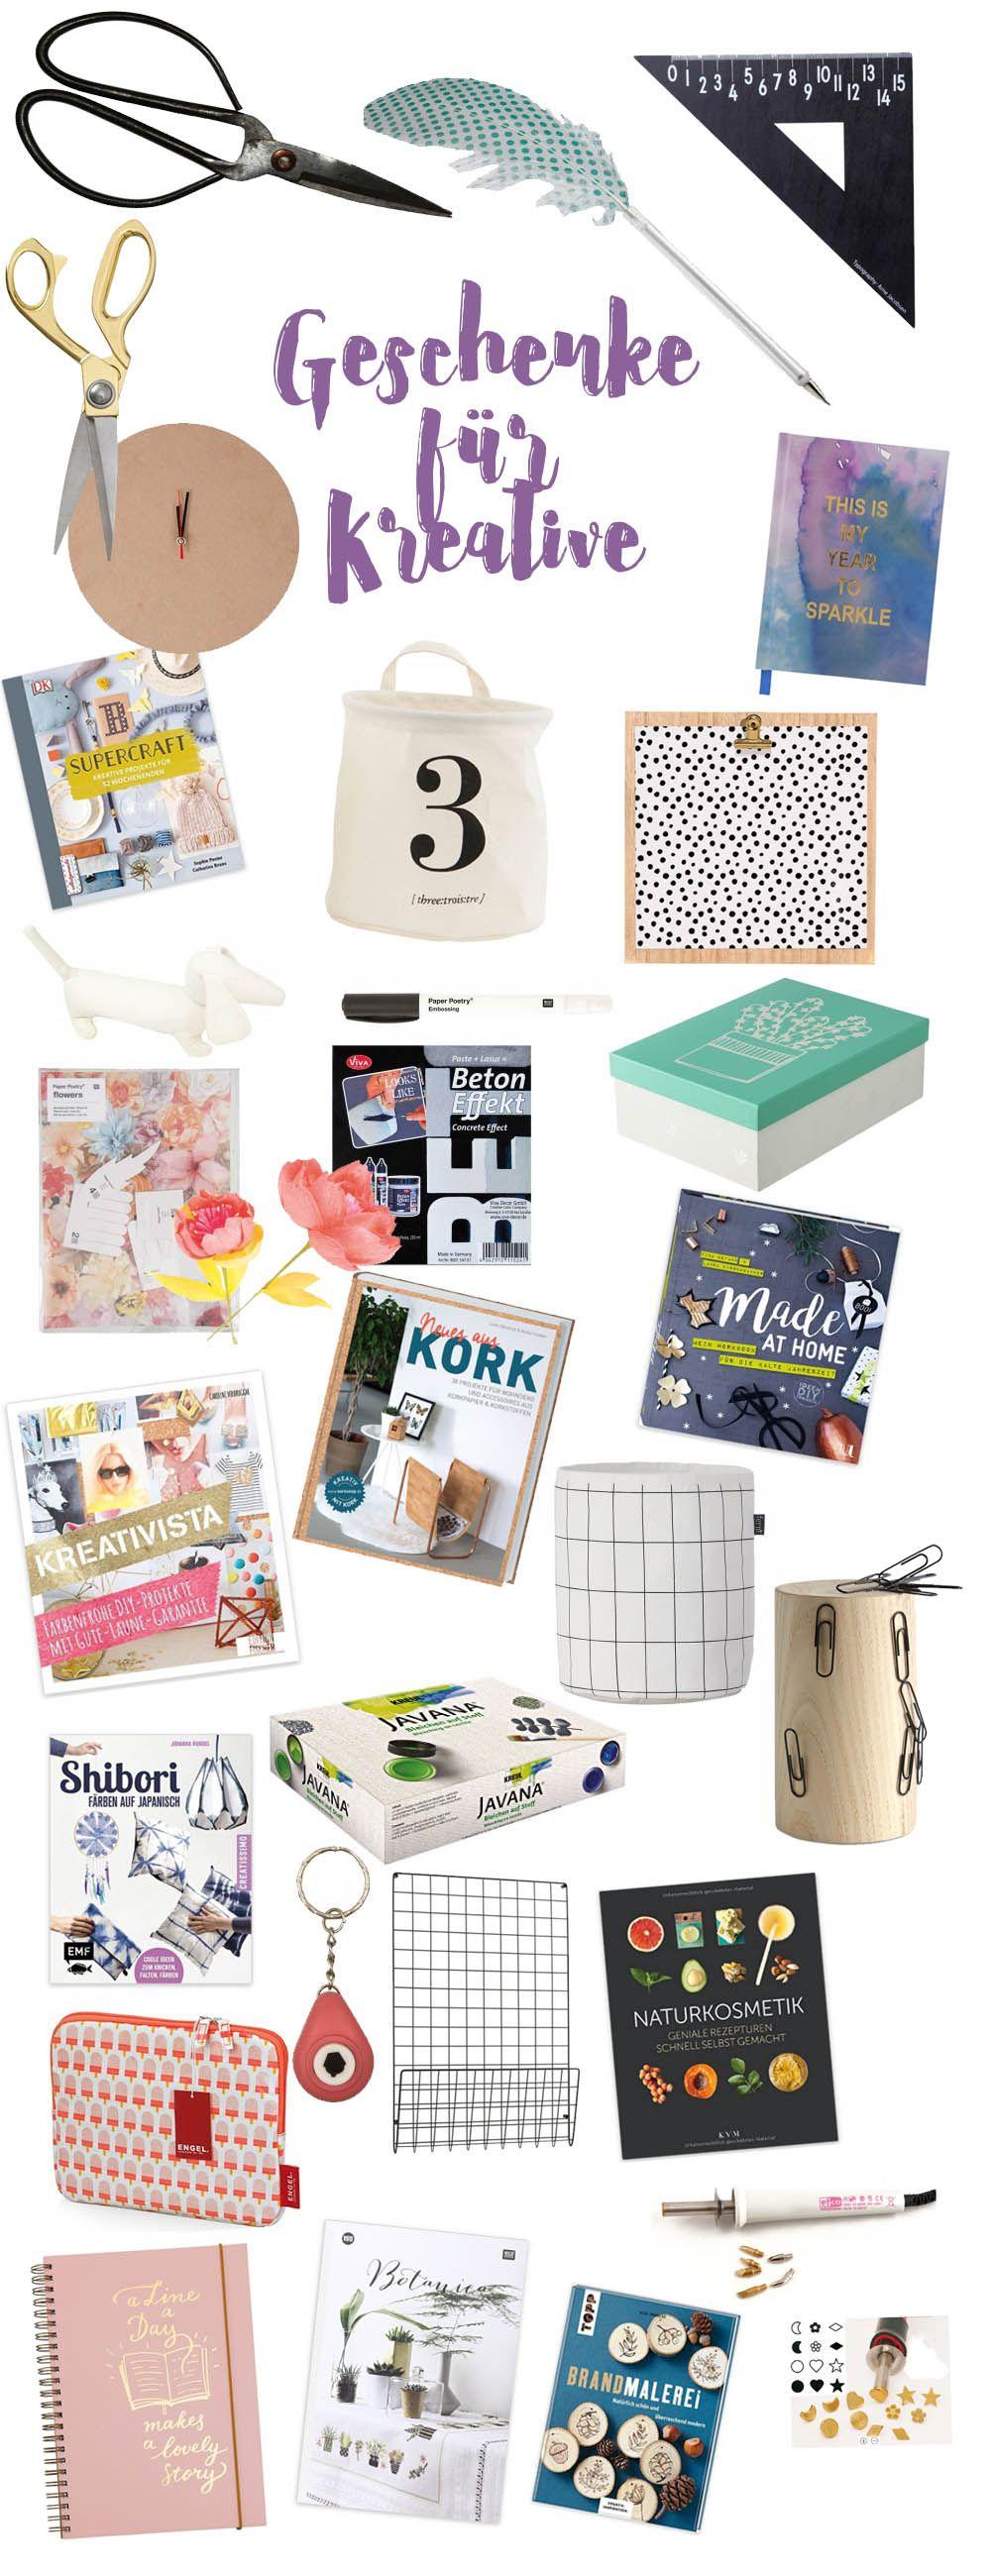 geschenke f r kreative diy geschenkideen. Black Bedroom Furniture Sets. Home Design Ideas